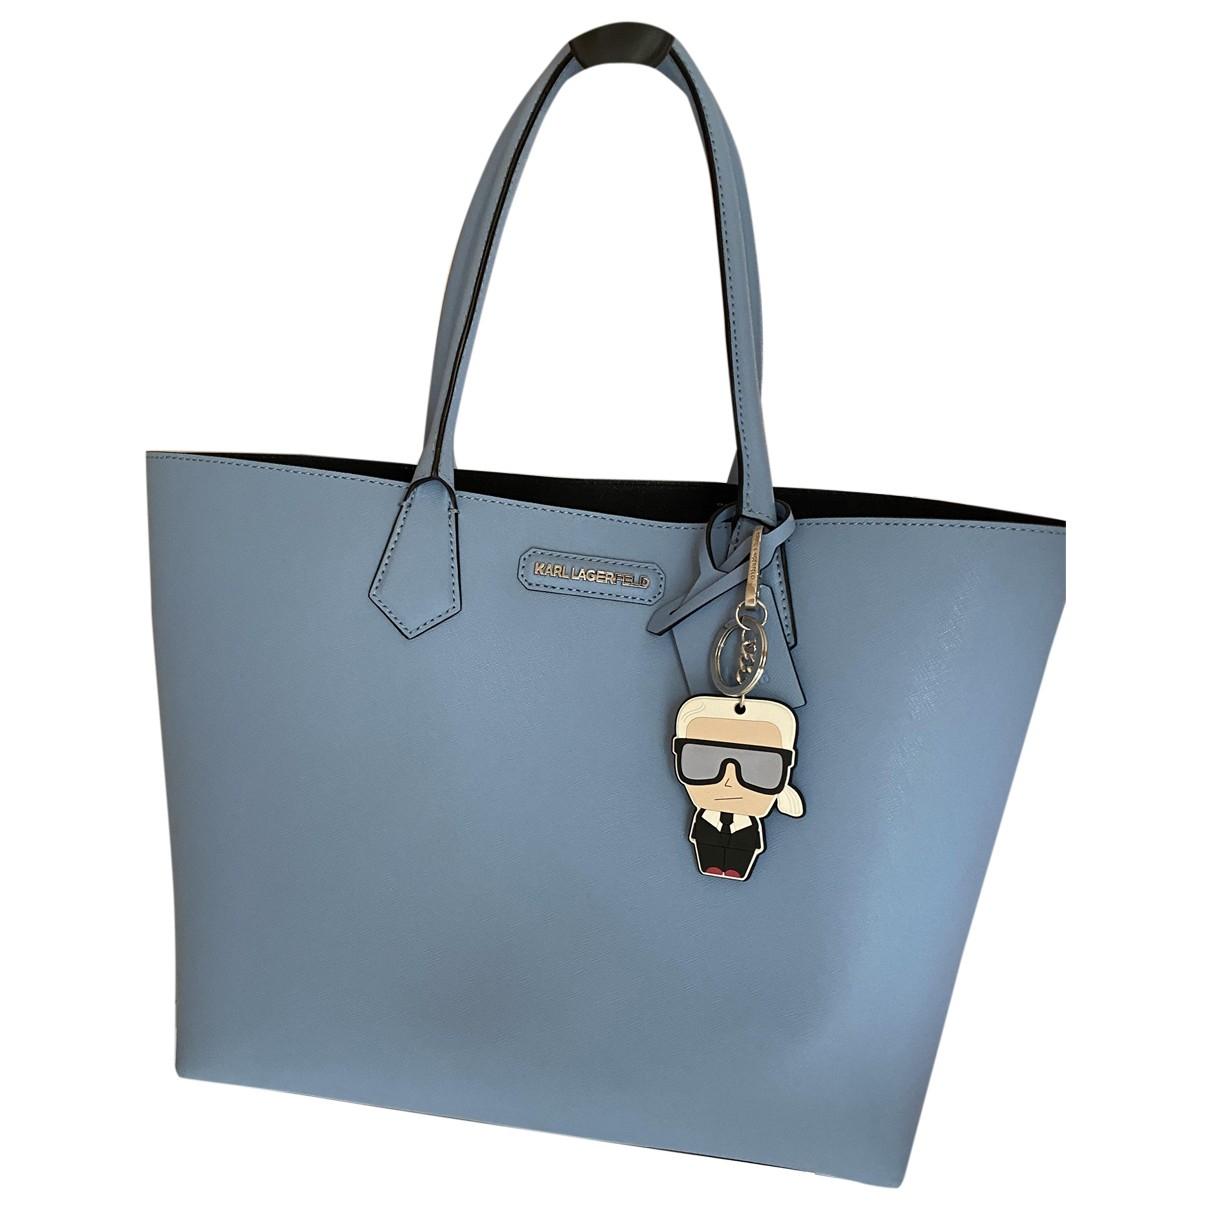 Karl Lagerfeld \N Handtasche in  Blau Veloursleder